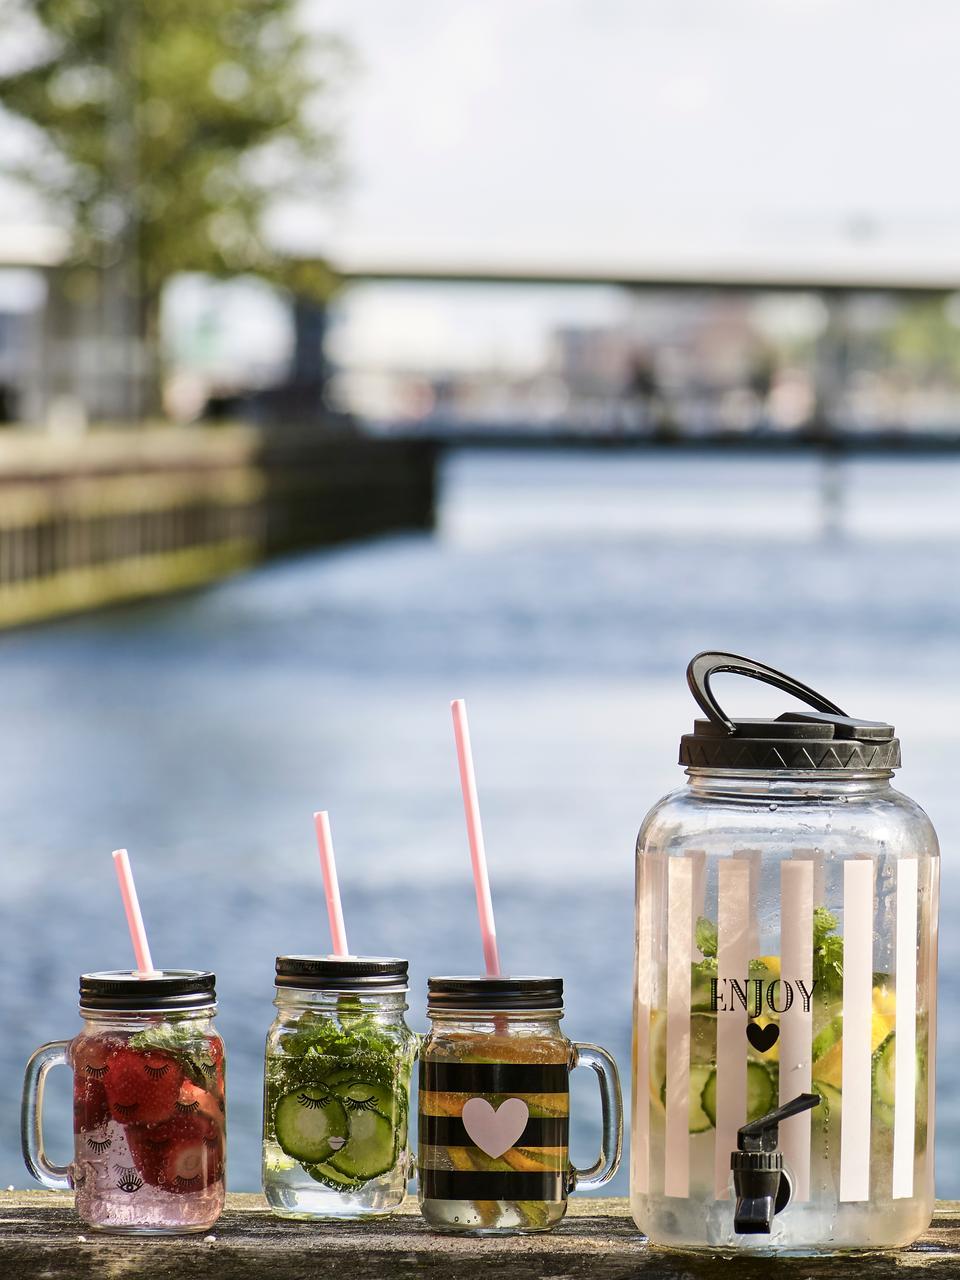 Trinkgläser Stripes & Heart, 2 Stück, Behälter: Glas, Deckel: Metall, Kunststoff, Strohhalm: Kunststoff, Transparent, Schwarz, Rosa, Ø 7 x H 16 cm